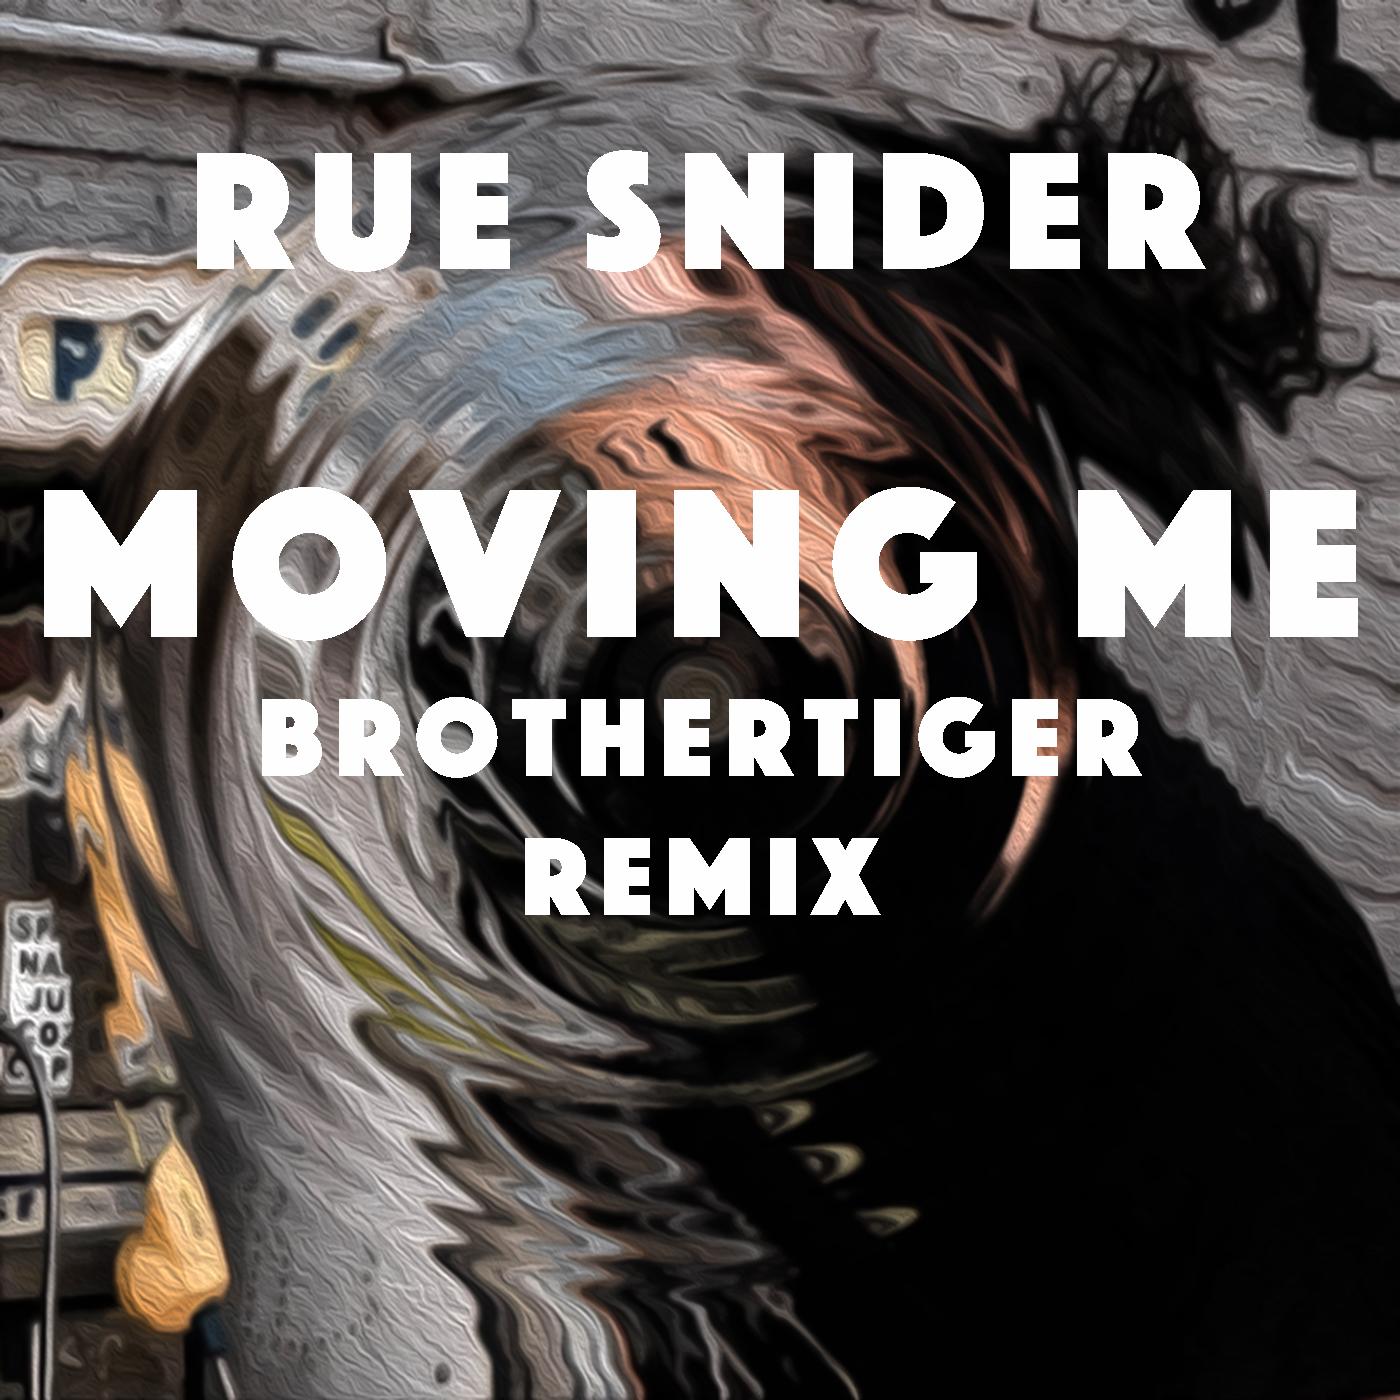 Moving Me (Brothertiger Remix) Cover Art.jpg